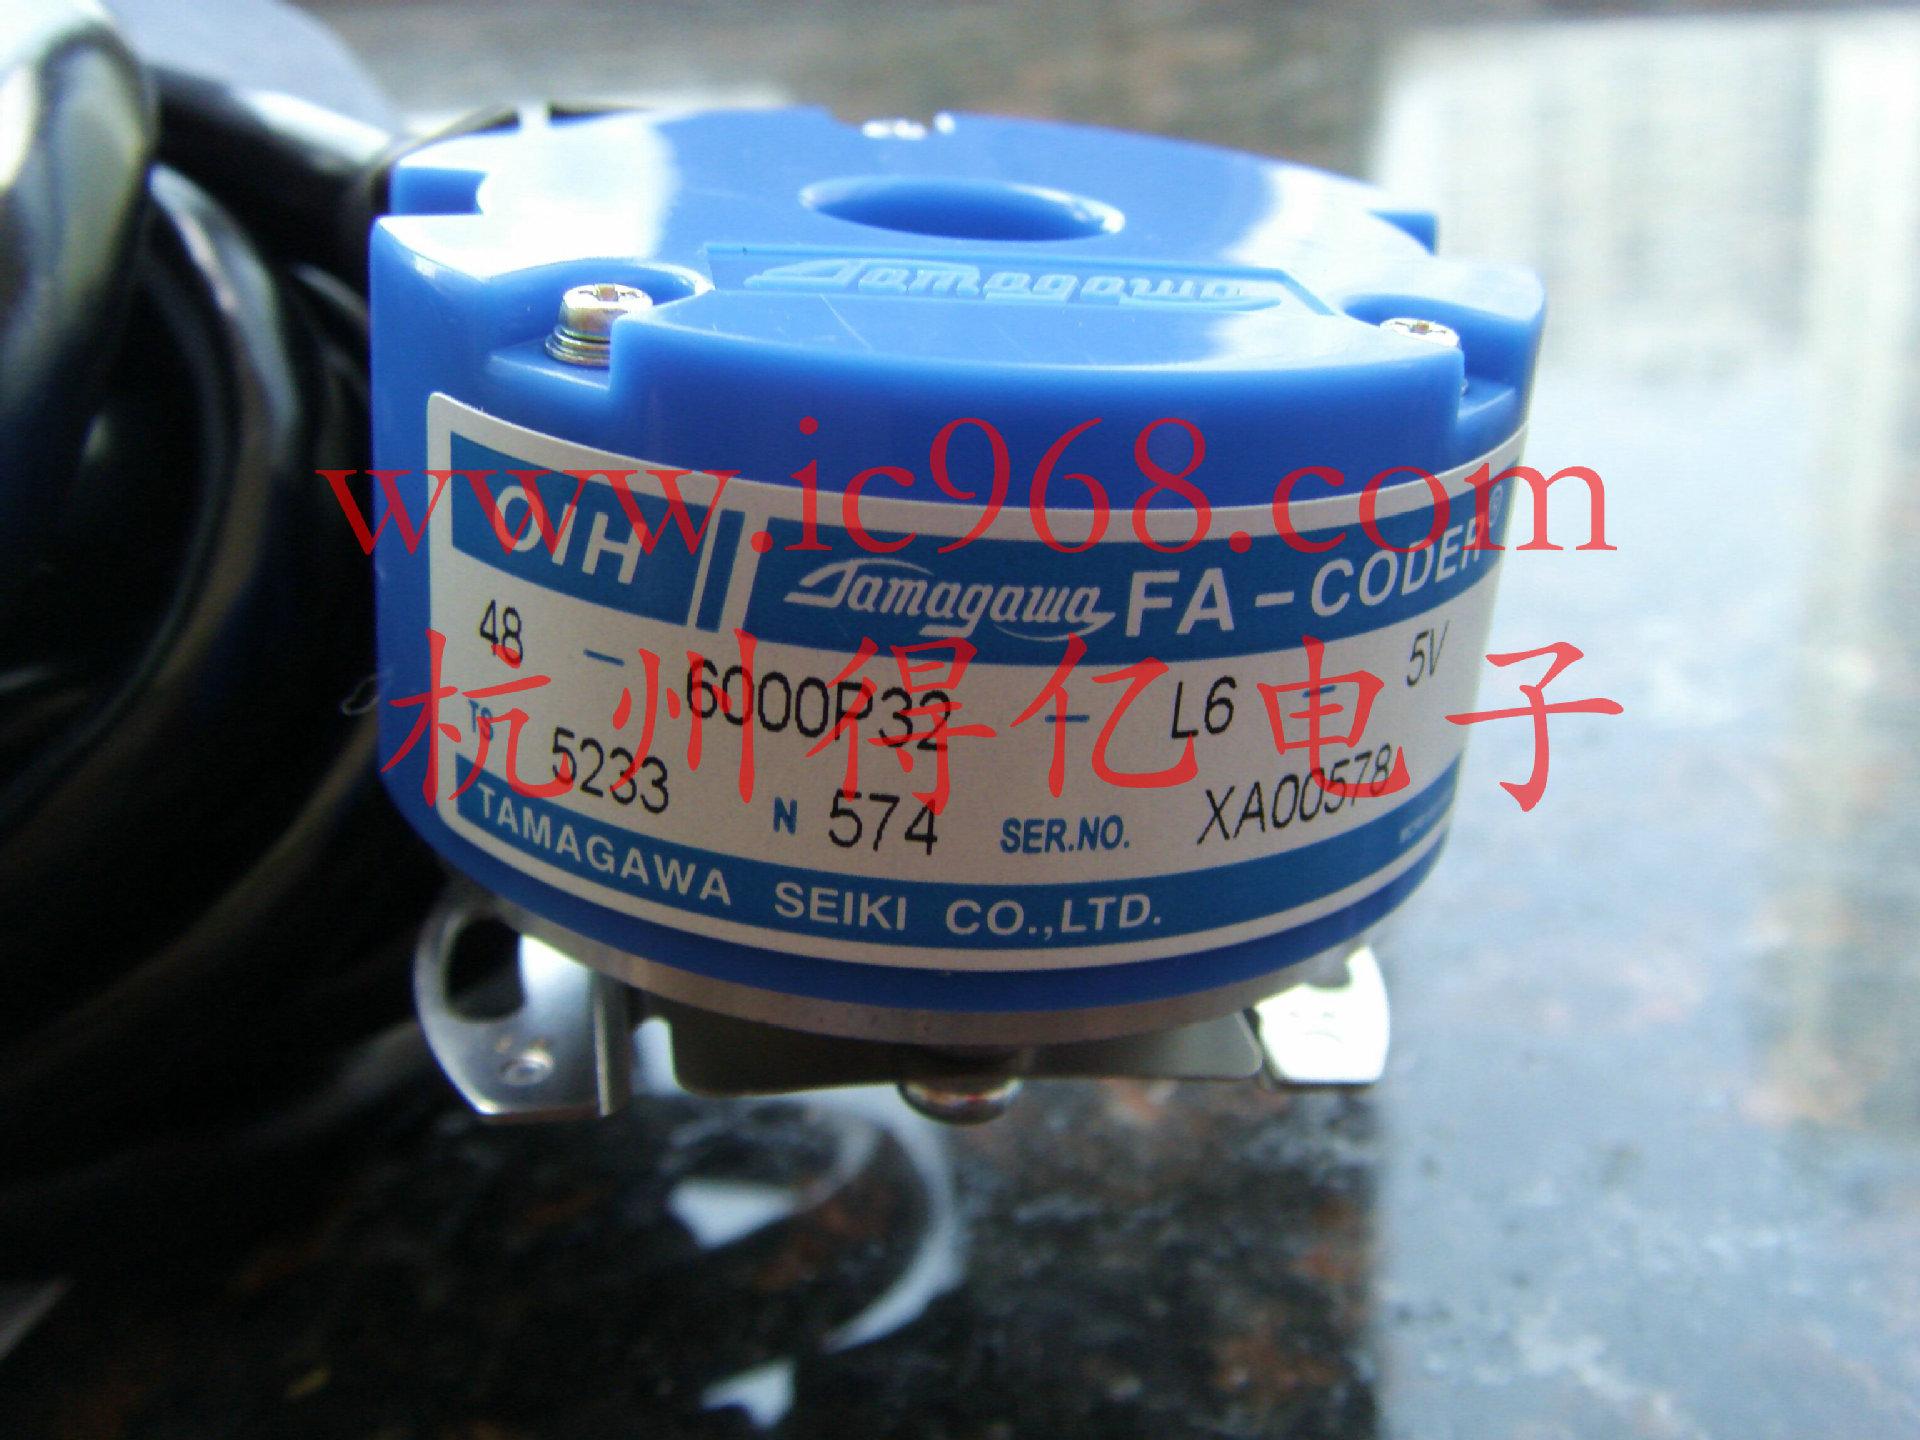 多摩川电梯编码器48-6000p32-l6-5v 型号ts5233n574 ts5233n574